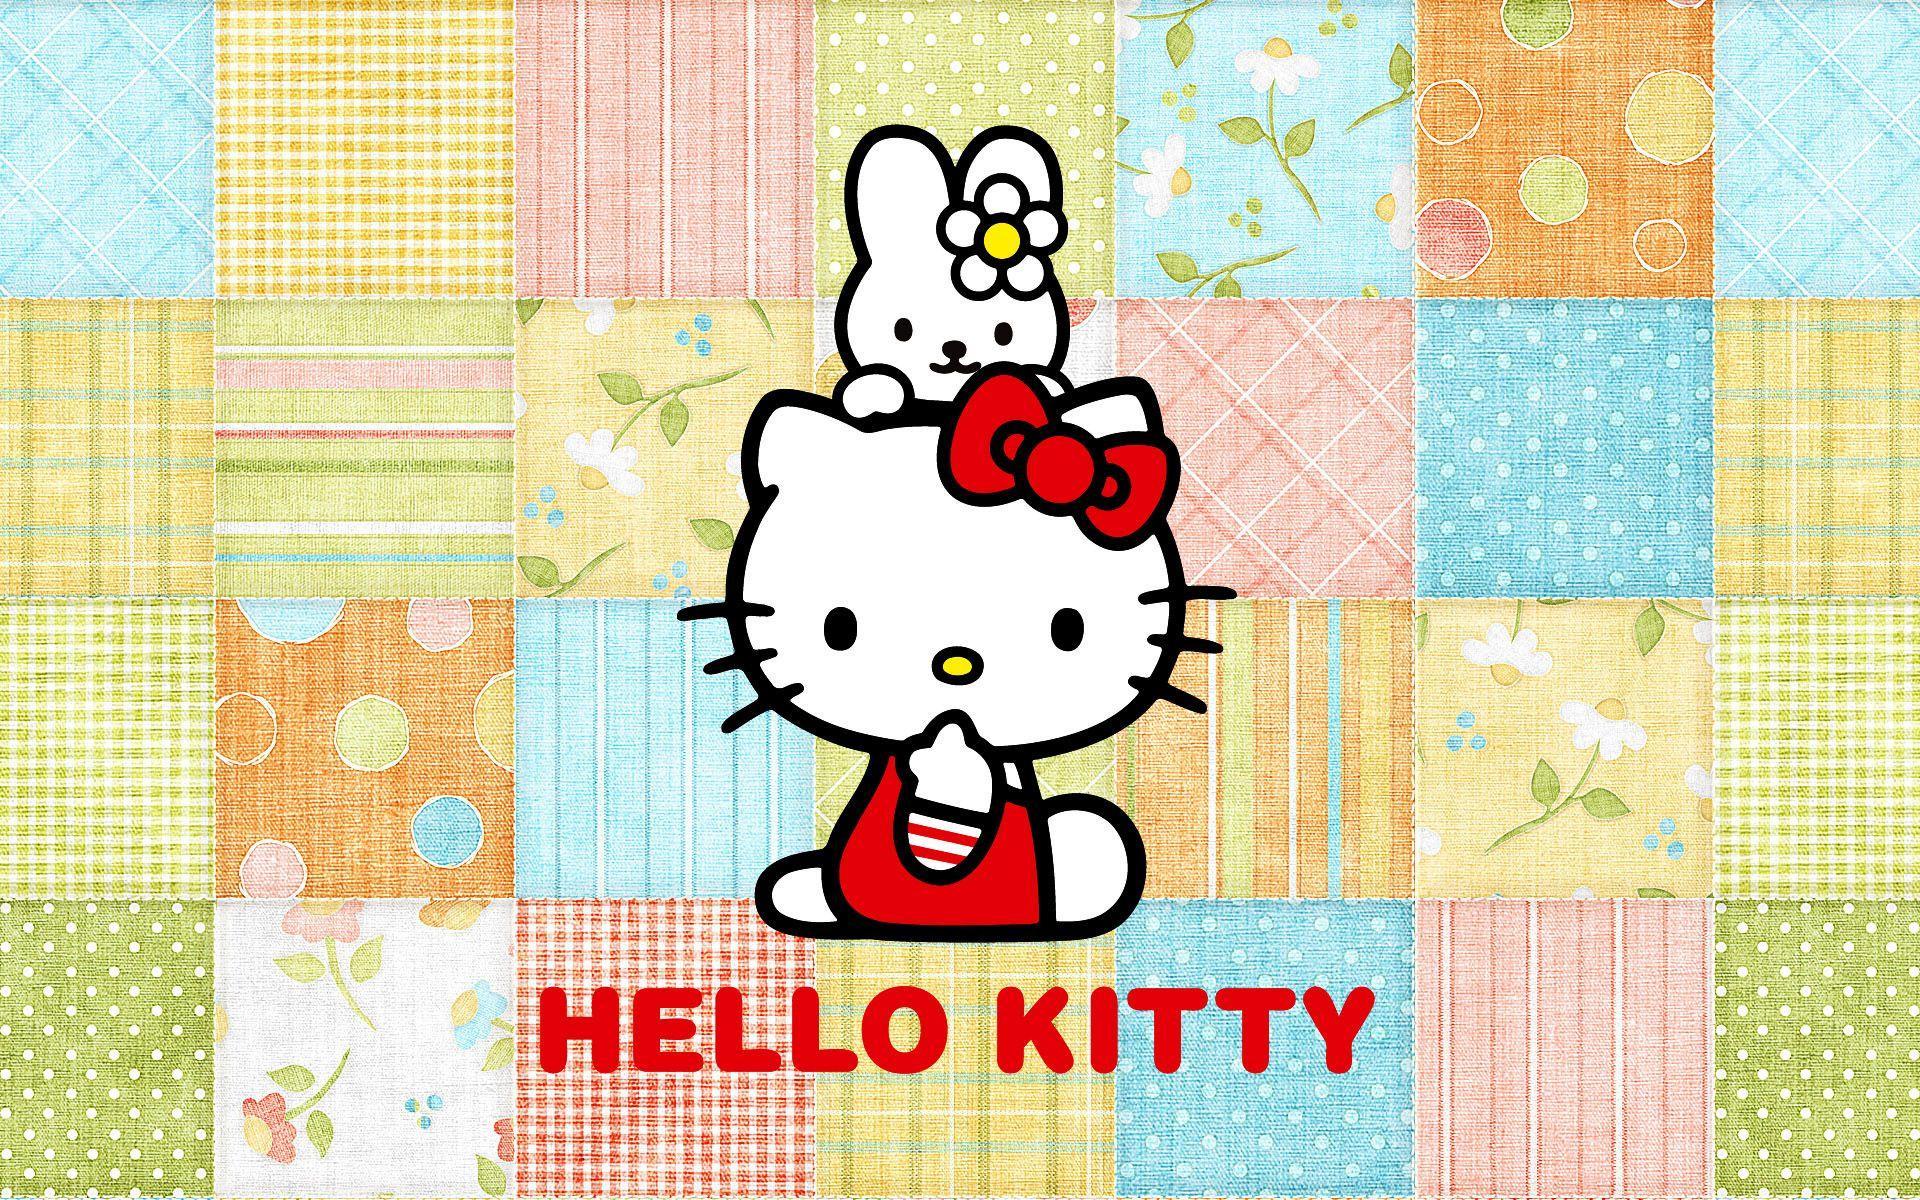 Hello Kitty Tokidoki Wallpapers Top Free Hello Kitty Tokidoki